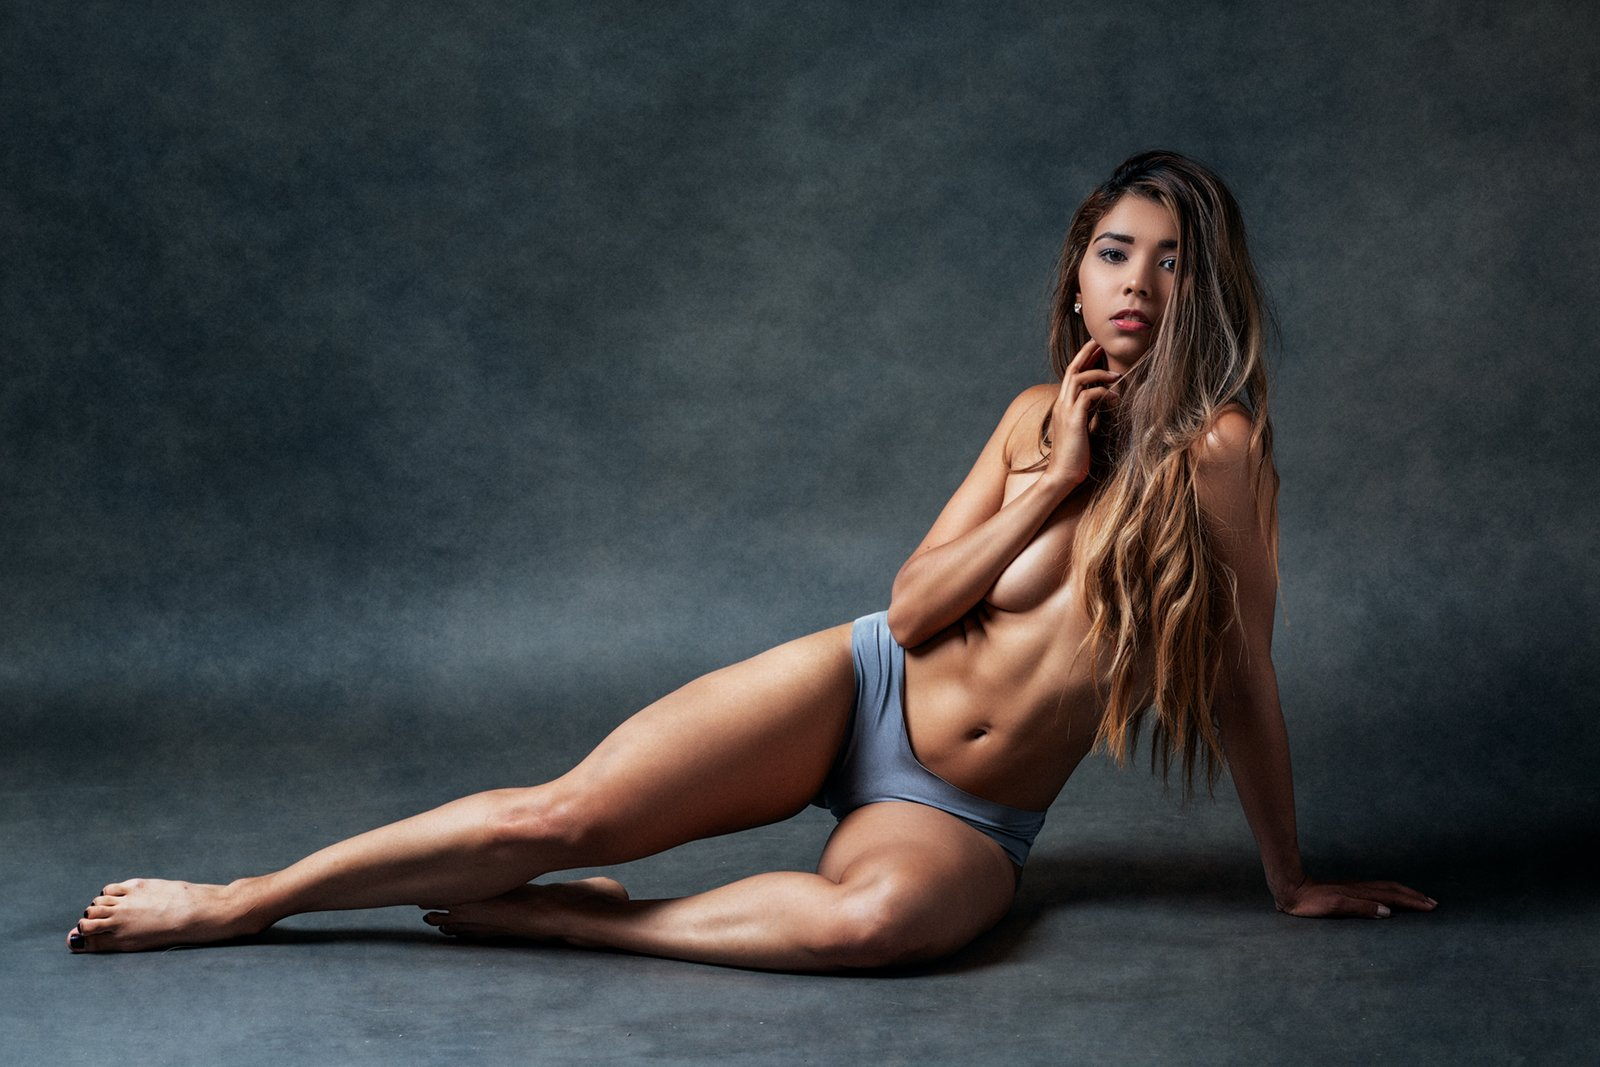 sexy, model, latin, boobs, venezolan, seductive, fitness, Gastón Luis